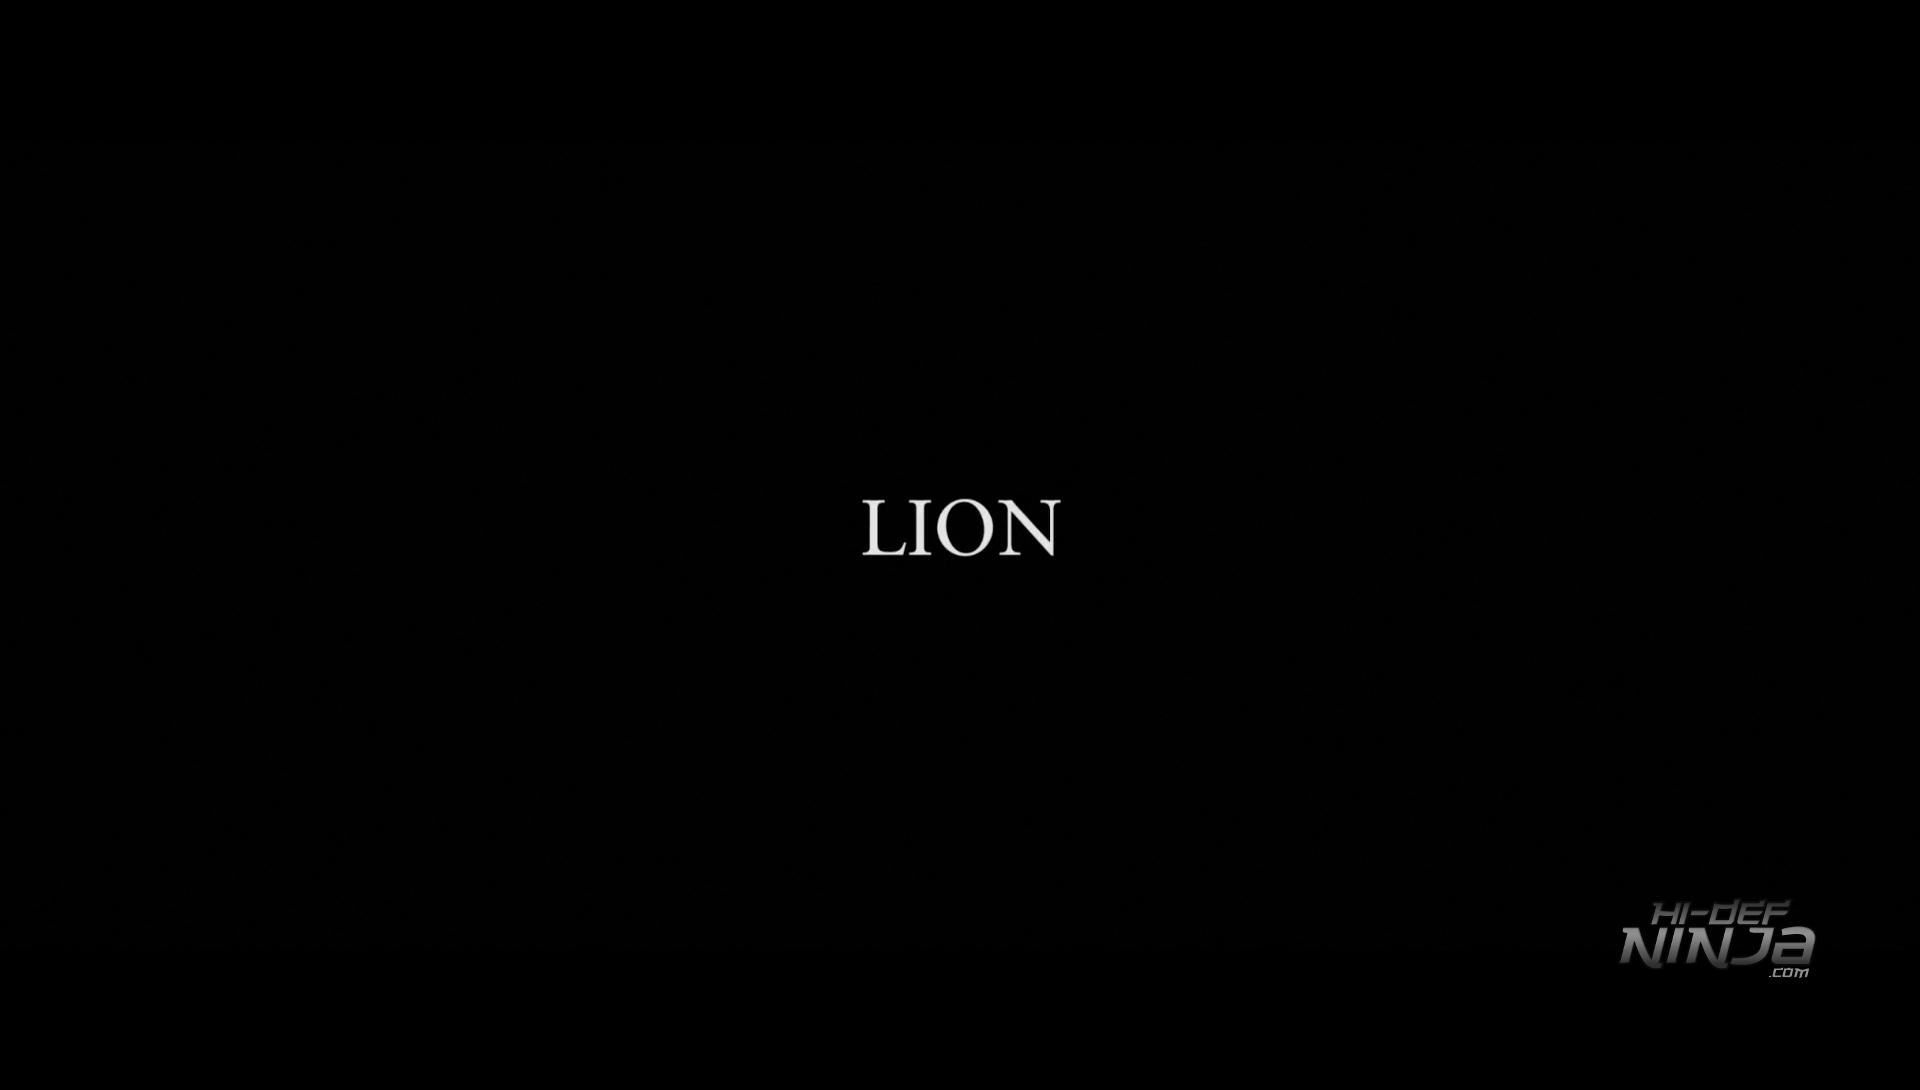 Lion-HiDefNinja (1)